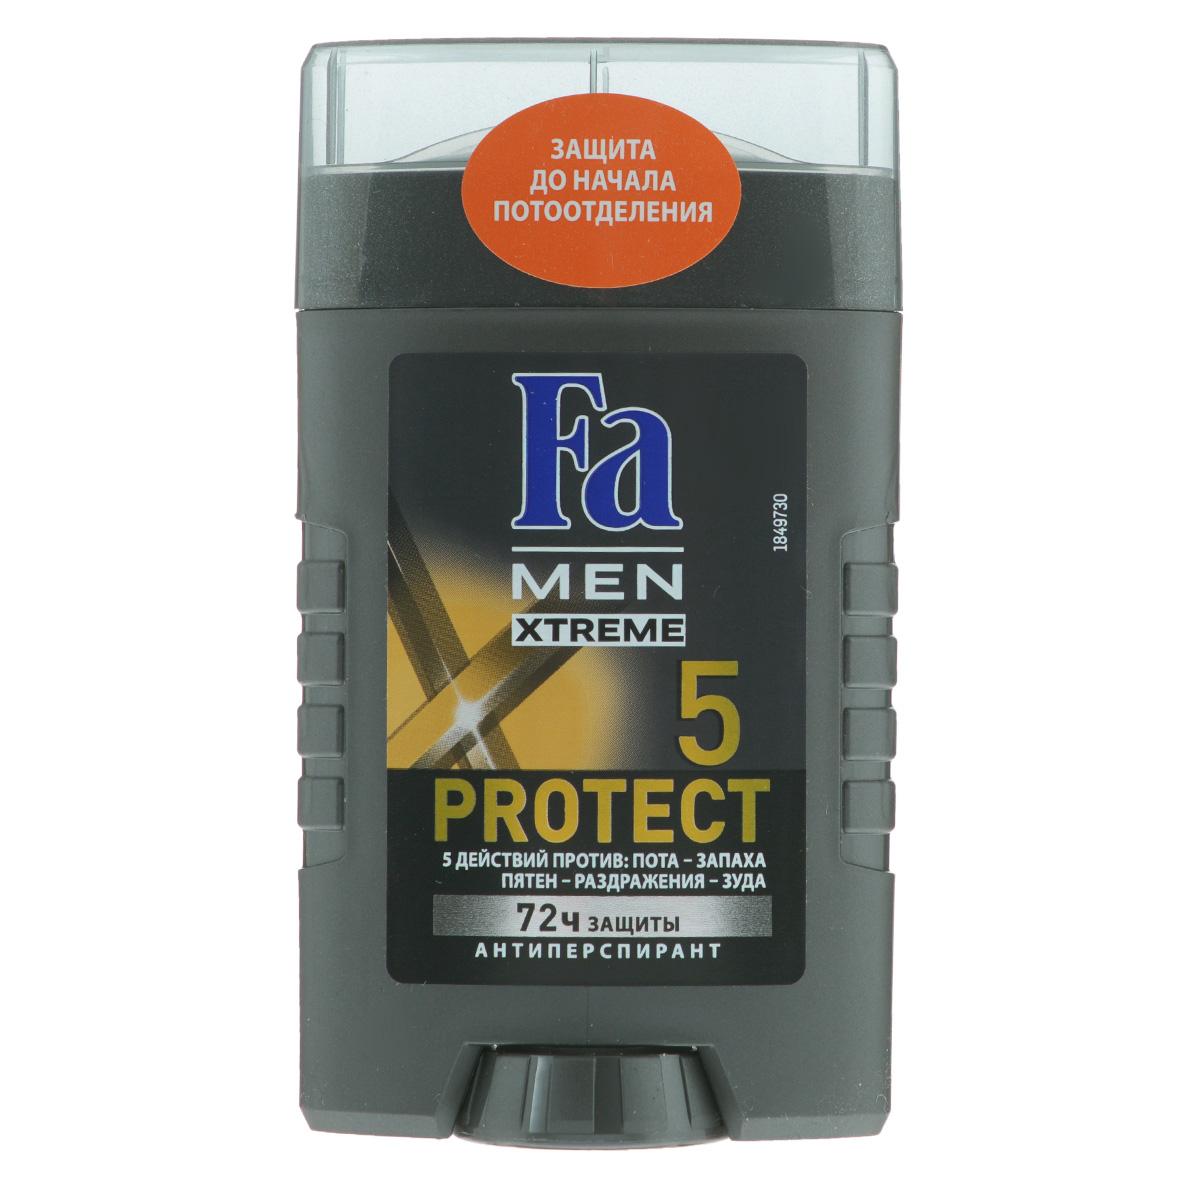 FA MEN Xtreme ���-���� Protect 5 , 50 �� - Fa1837762Fa MEN Xtreme Protect 5 � ����������� �������������� � 5 �������� ������: ����, ������, �����, ����������� � ����! ������������� ������� � ����������� Sweat Detect* ������� � ����� ��� �� ��� ���������. 72 ���� ����������������� ������ ������ ��������� � ������ ����. ������� � ���������� ������ � ������������ ���������� ��������. ������ ��������. ����� ������������ �������������� ��������, �������� ��� � ����� ��� ���� Fa Men Xtreme.